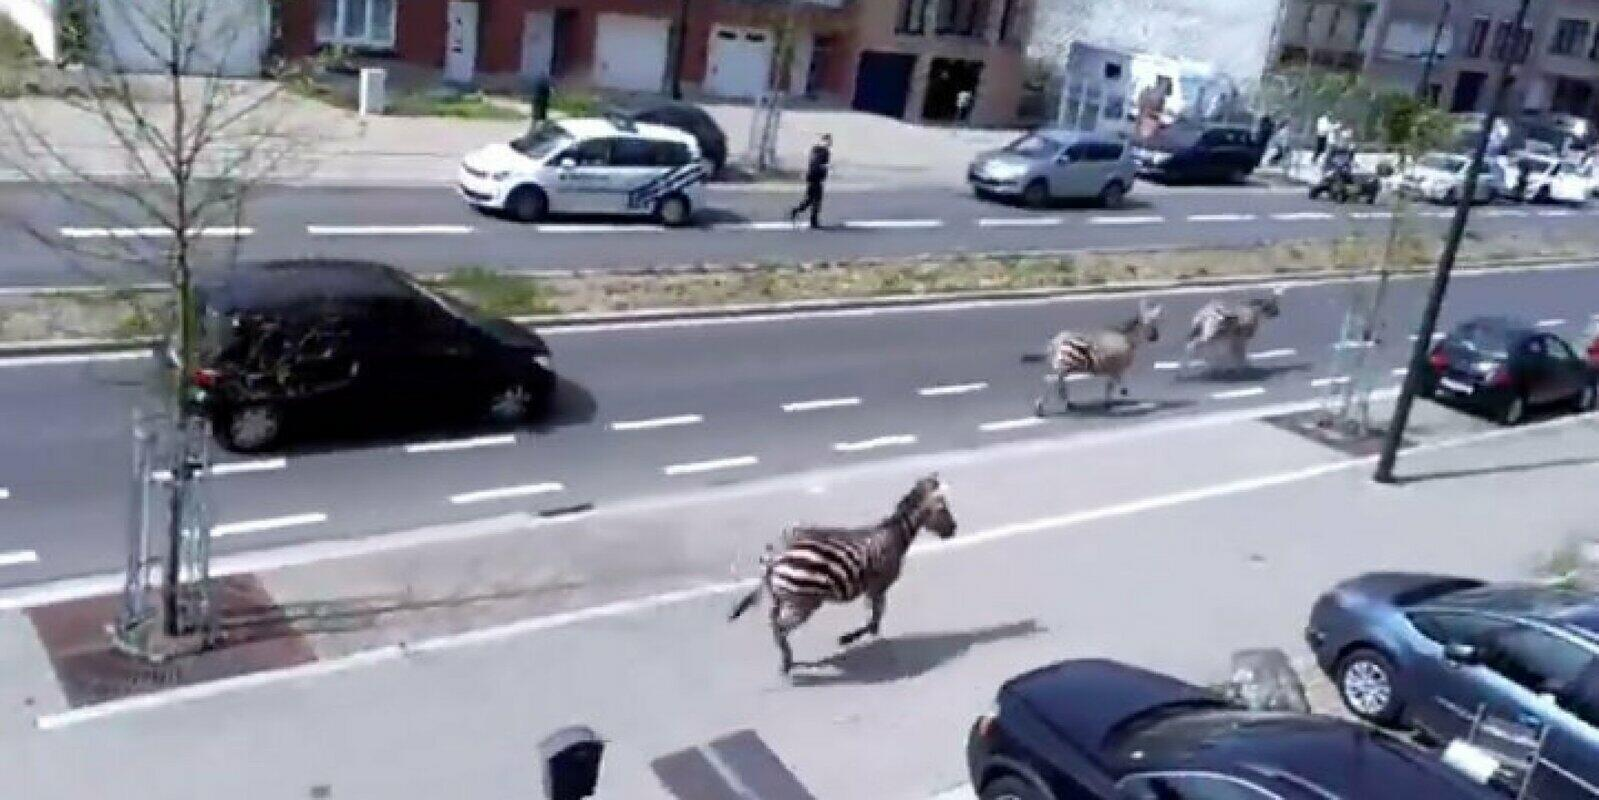 Boughton_Zebras in Belgium